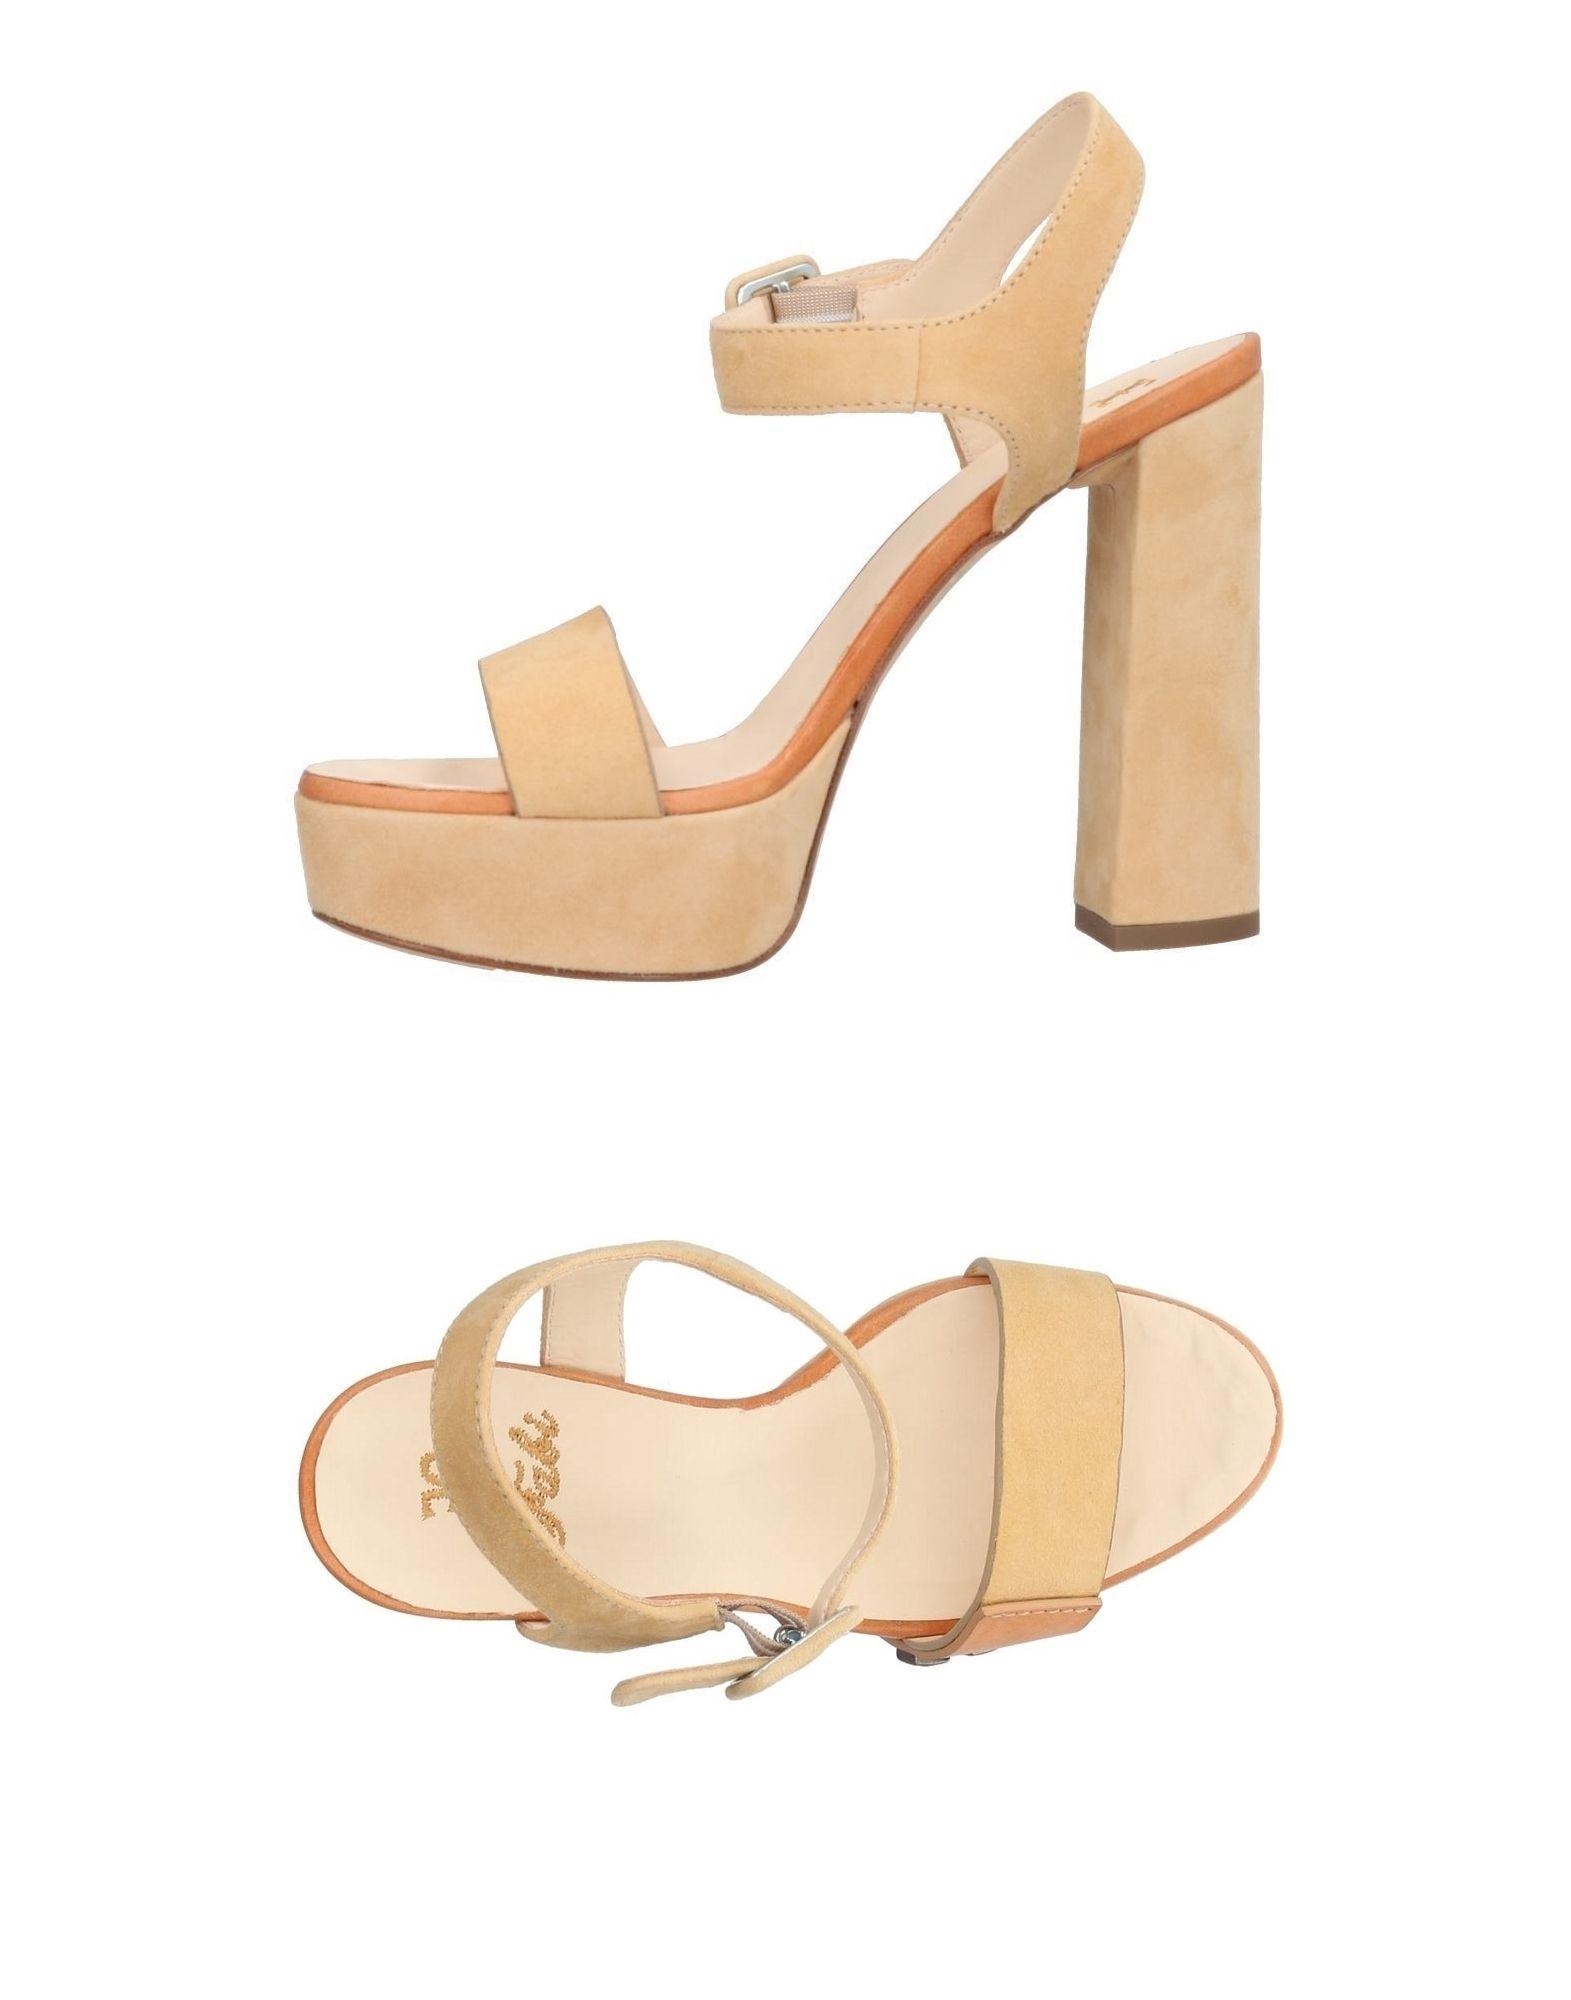 Sandales Fabi Femme - Sandales Fabi   - 11415545LW